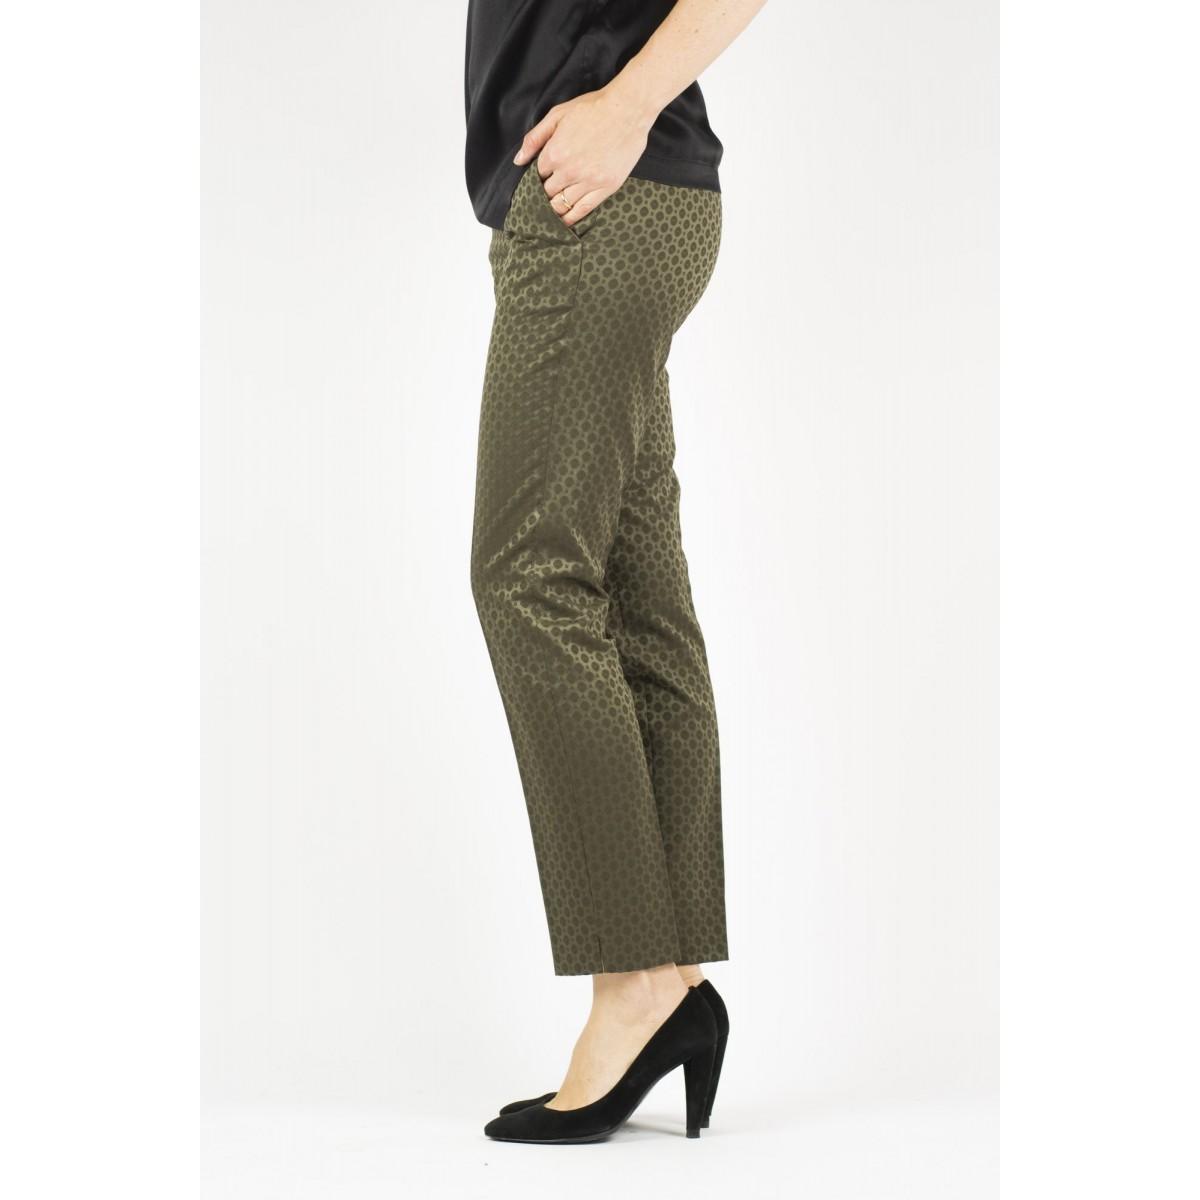 Pantalone Donna Pt0W - Sny Bl05 Fantasia